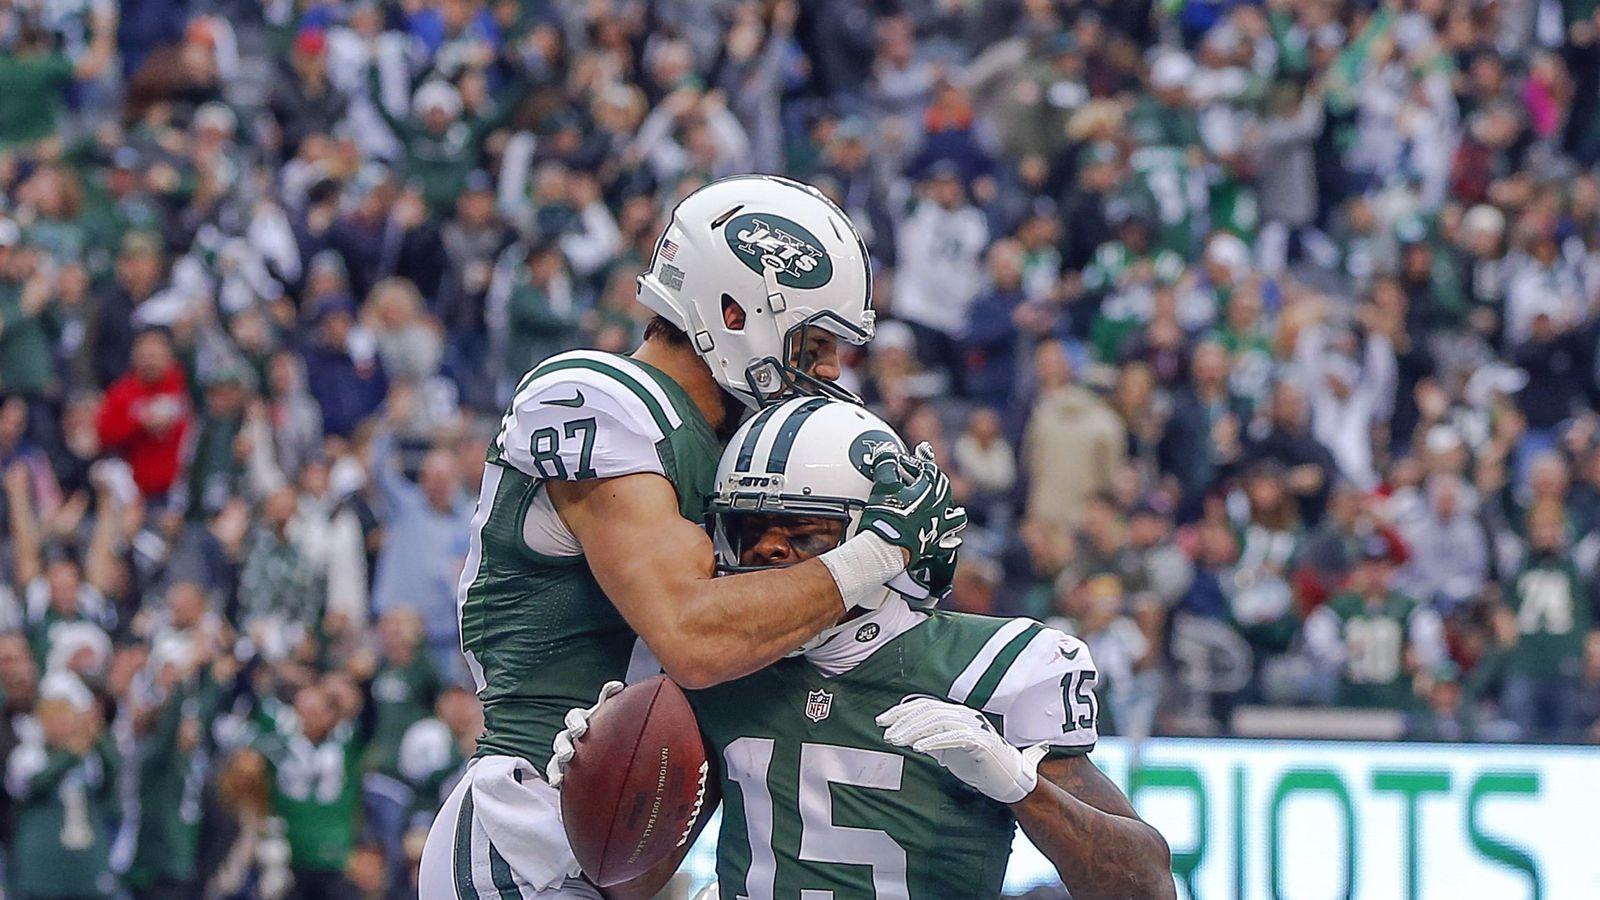 Jets vs. Bills 2016 picks and predictions: New York ...